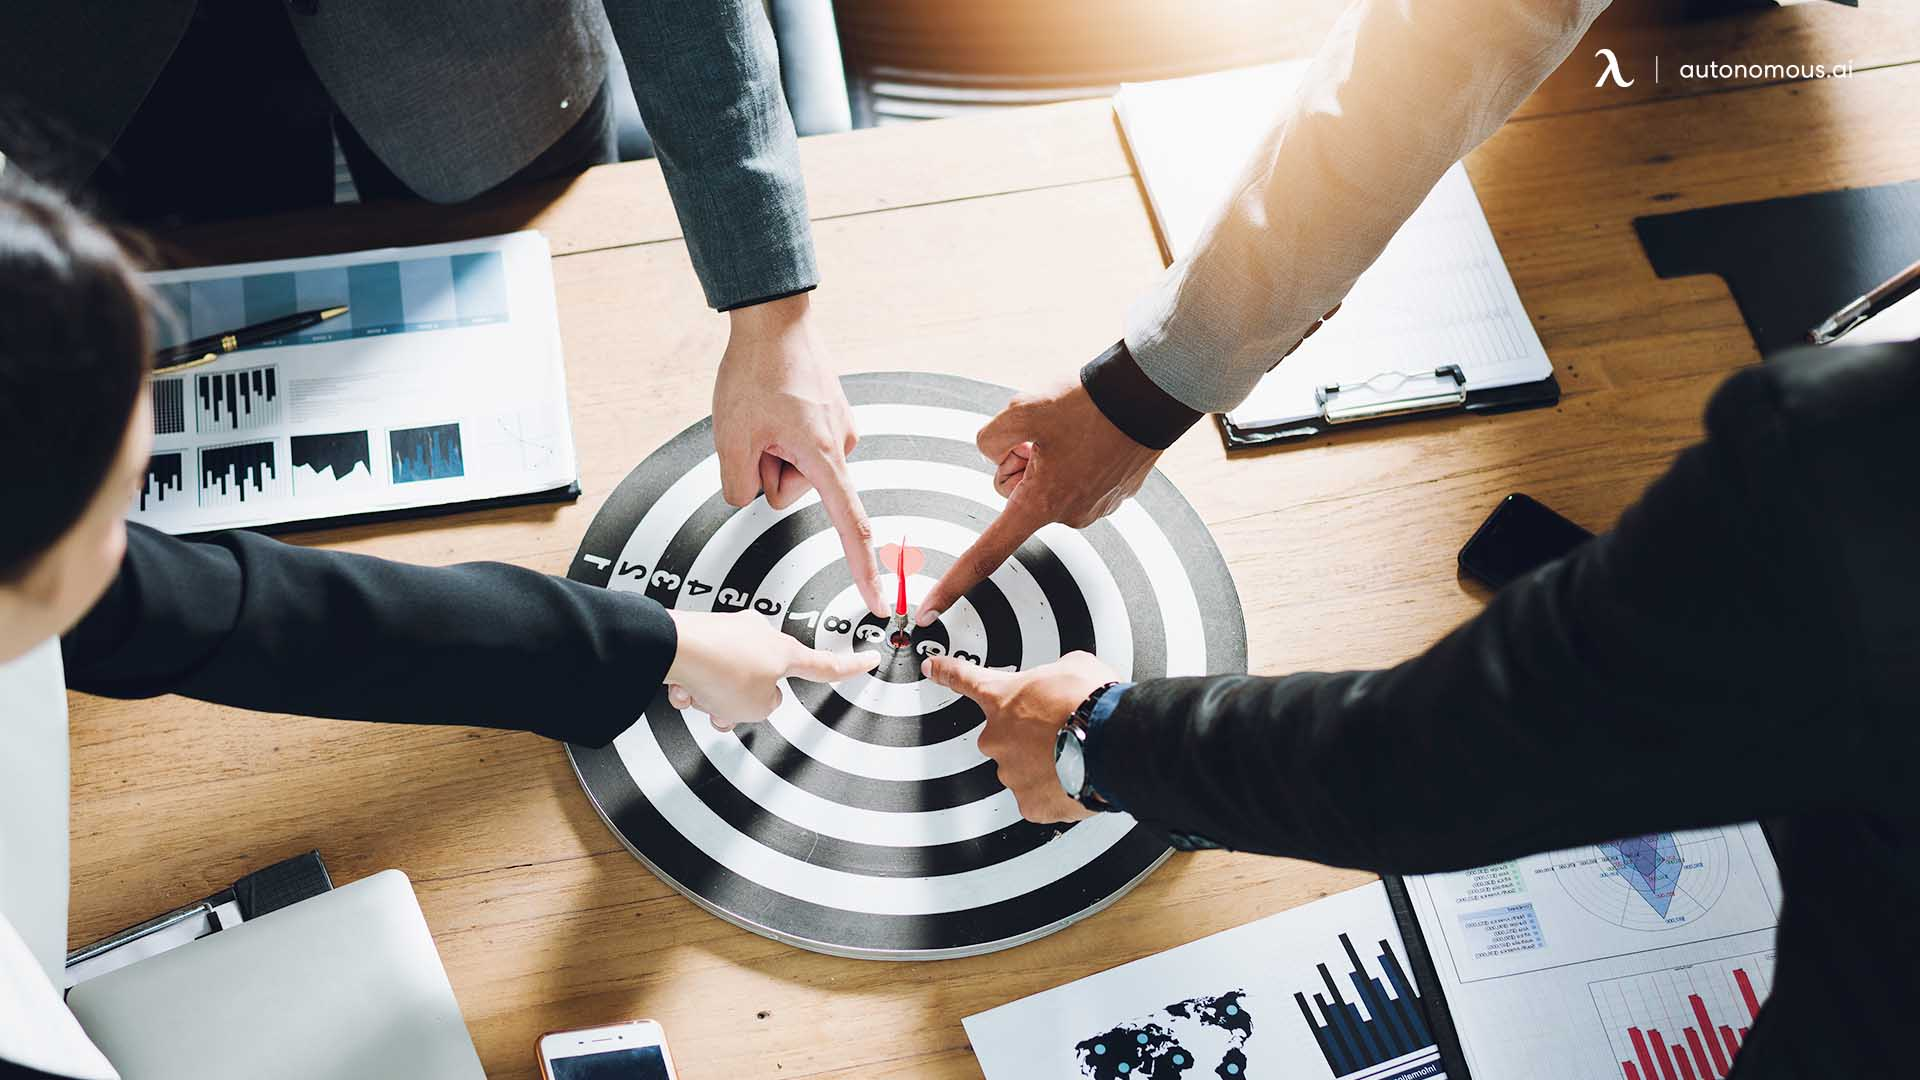 How to write a career development plan: 5 steps